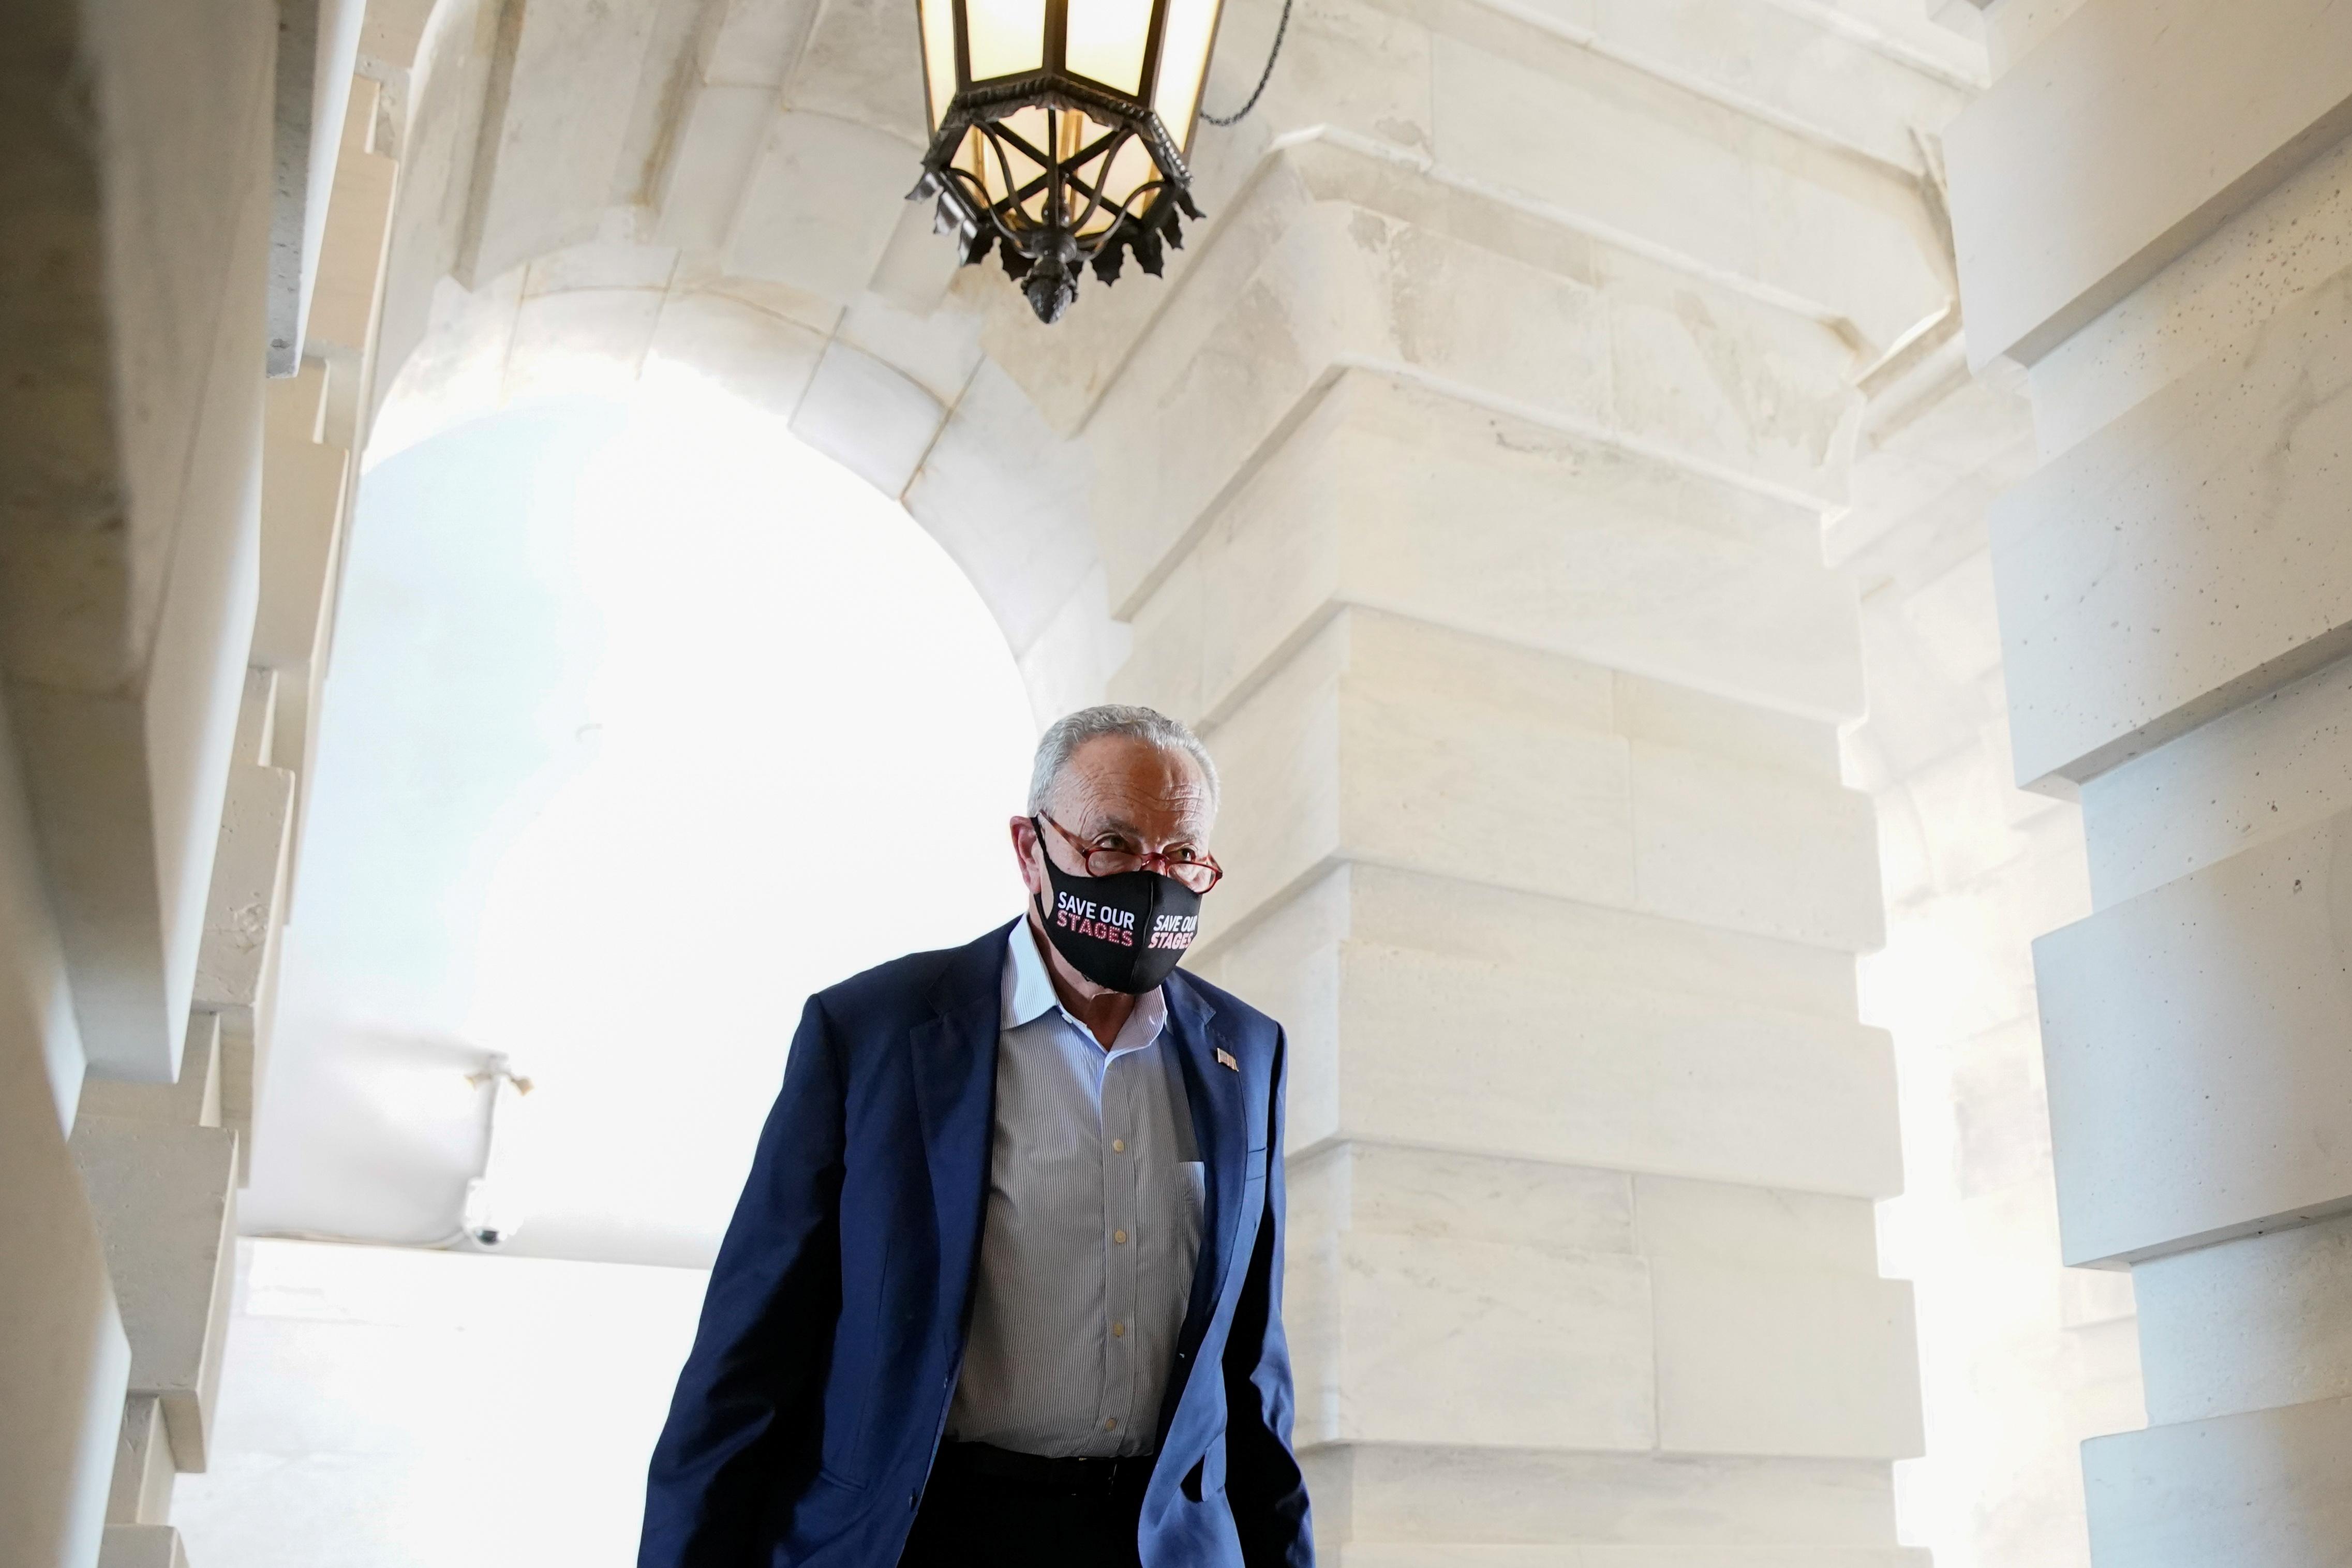 Senate Majority Leader Chuck Schumer (D-NY) arrives to the U.S. Capitol in Washington, U.S., September 27, 2021. REUTERS/Elizabeth Frantz